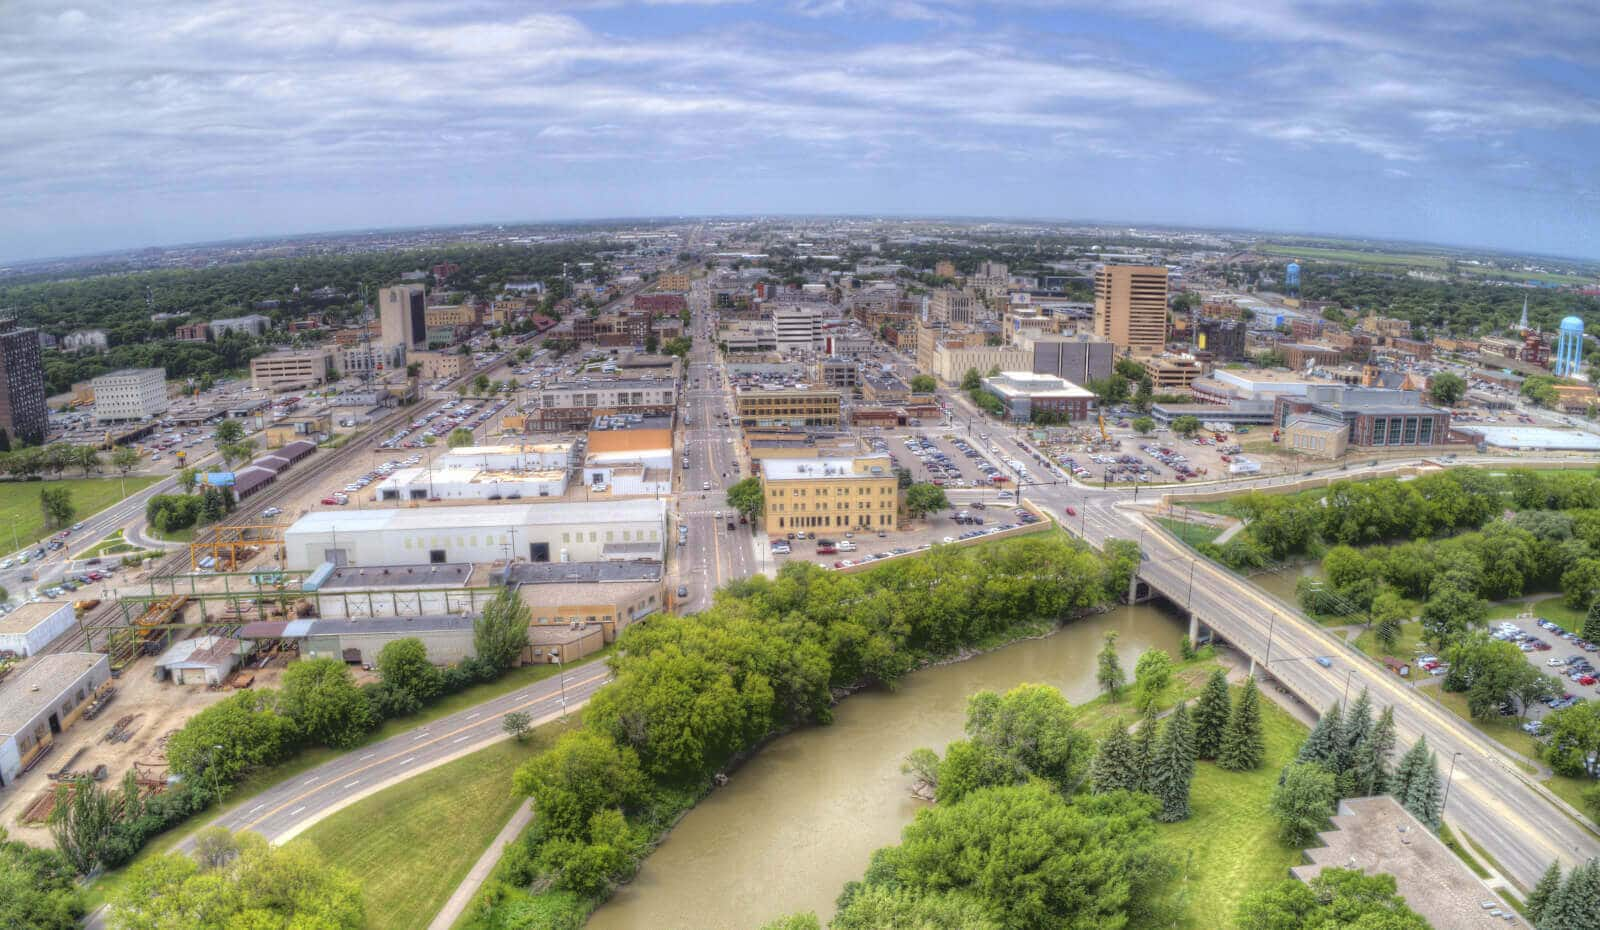 Find Drug and Alcohol Rehab in Fargo, North Dakota